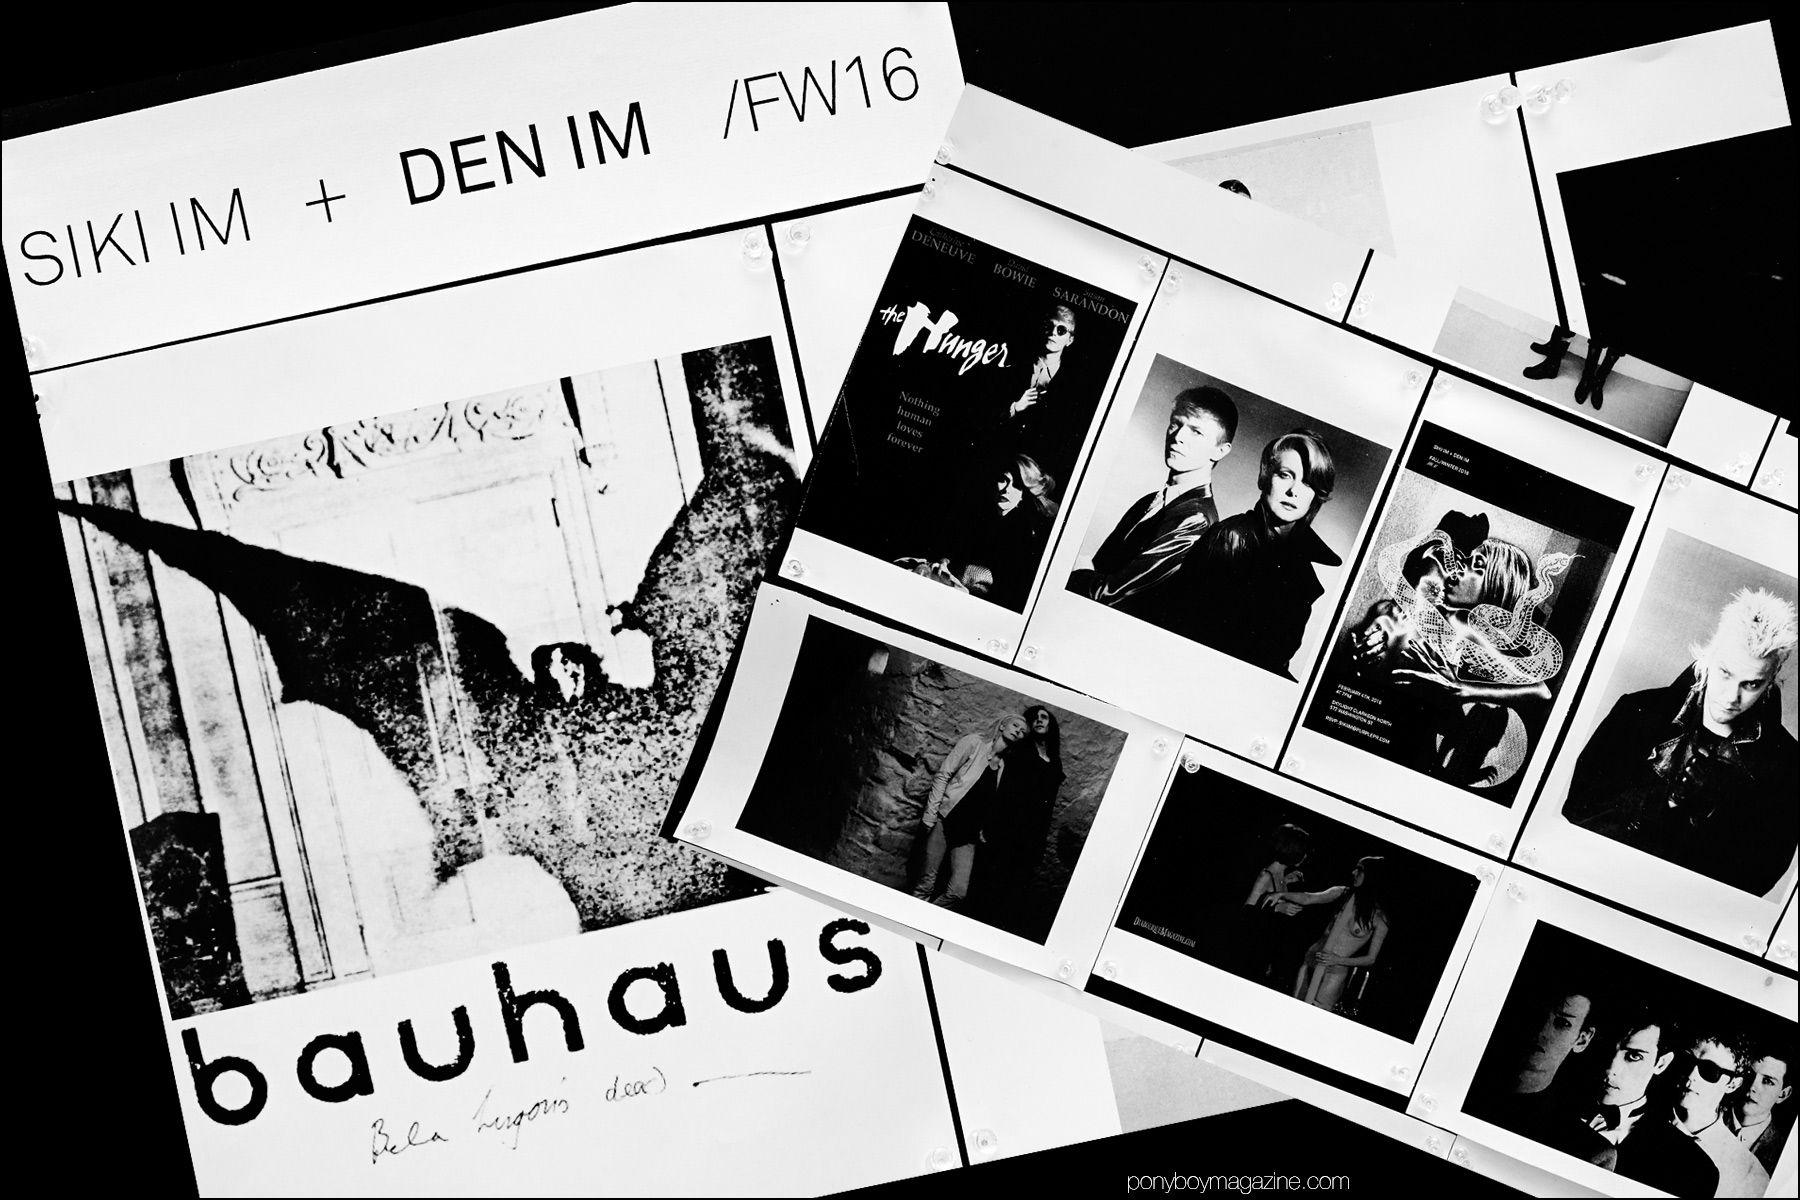 Inspiration/mood board backstage at Siki Im + Dem Im F/W16 menswear show. Photograph by Alexander Thompson for Ponyboy magazine NY.